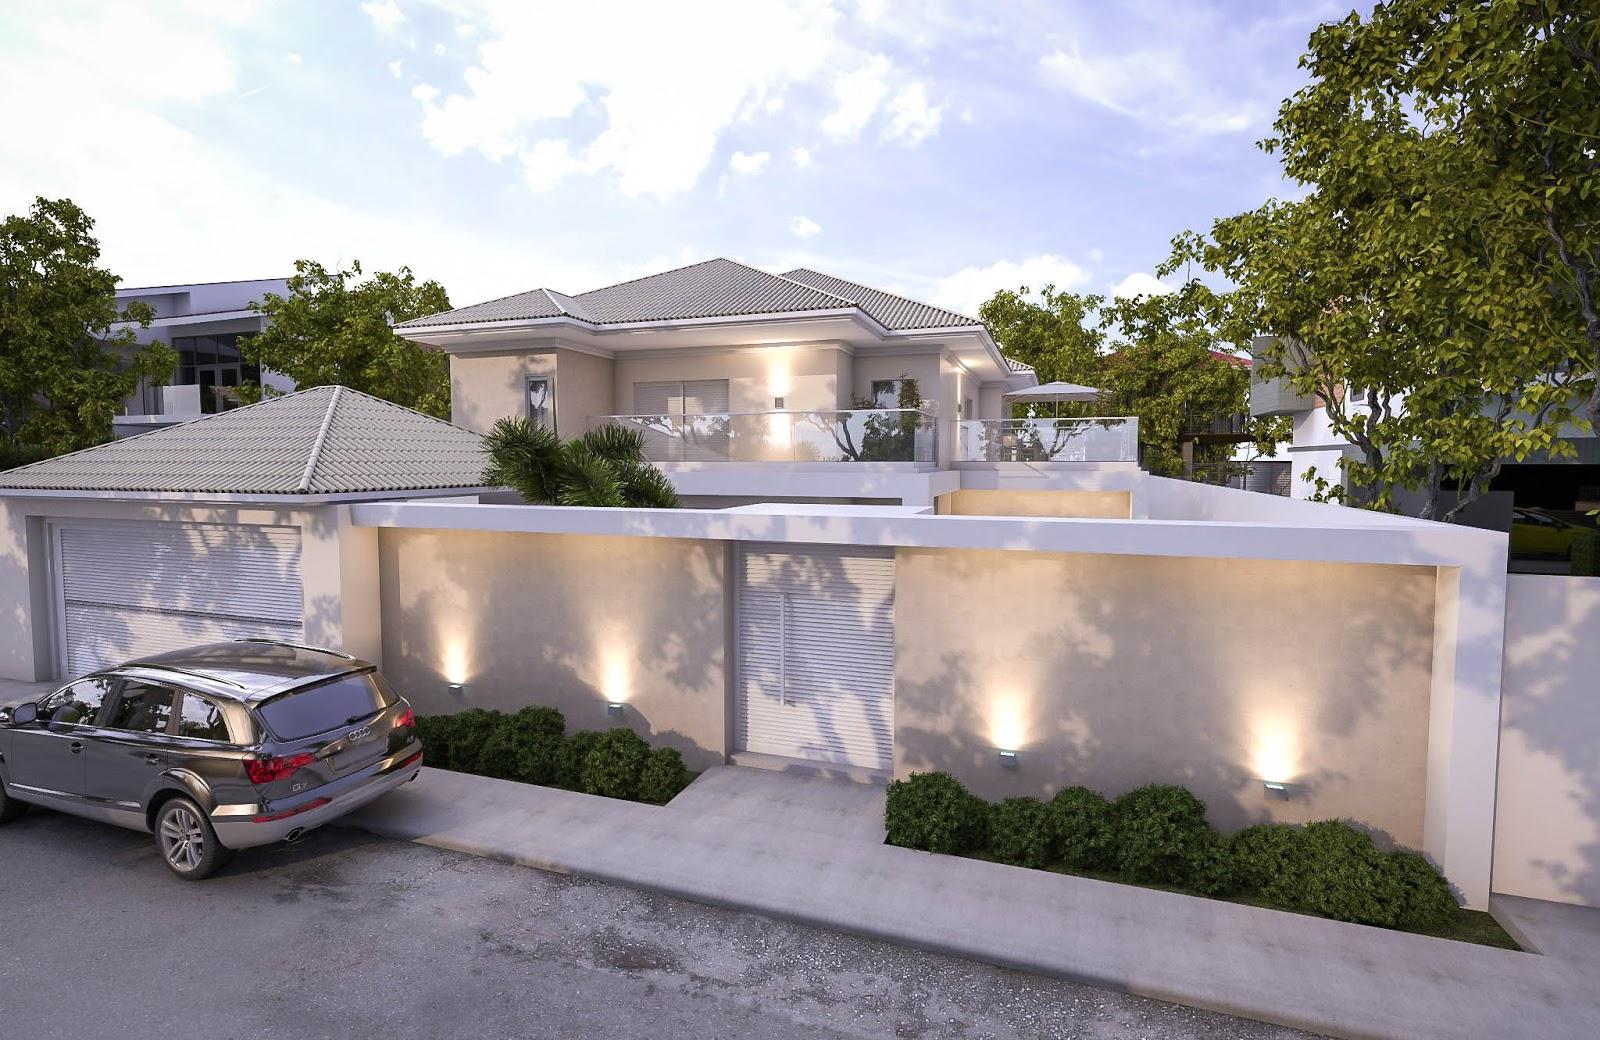 Arquitecto mondlane joaquim residencia t4 benfica luanda for Arquitecto t4